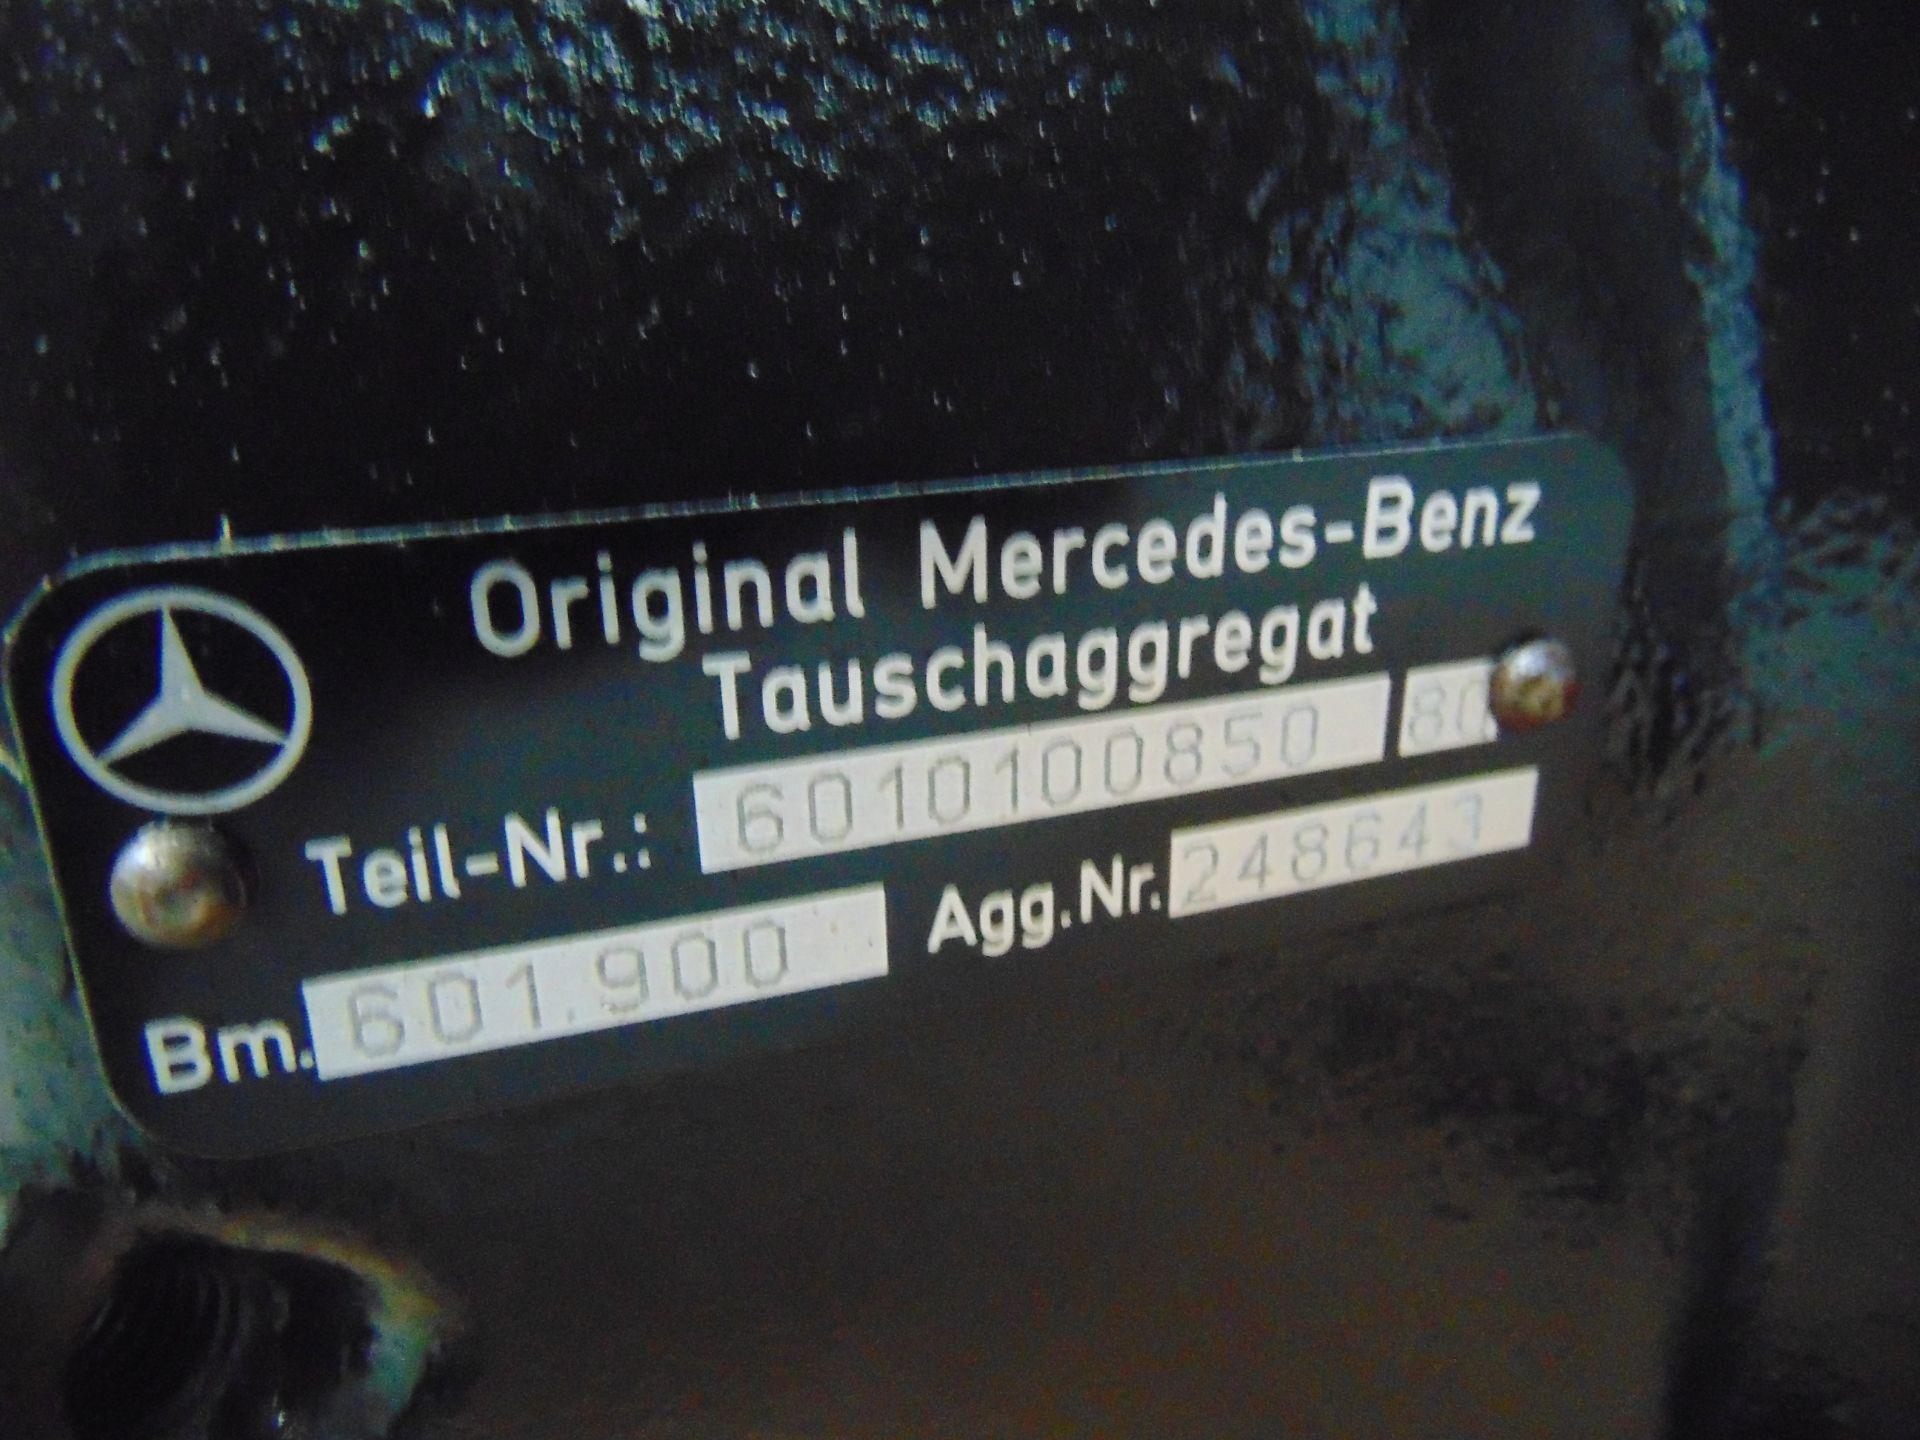 Lot 8 - Brand New & Unused Mercedes-Benz OM601 4 Cylinder 2.0l Diesel Engine C/W Injectors